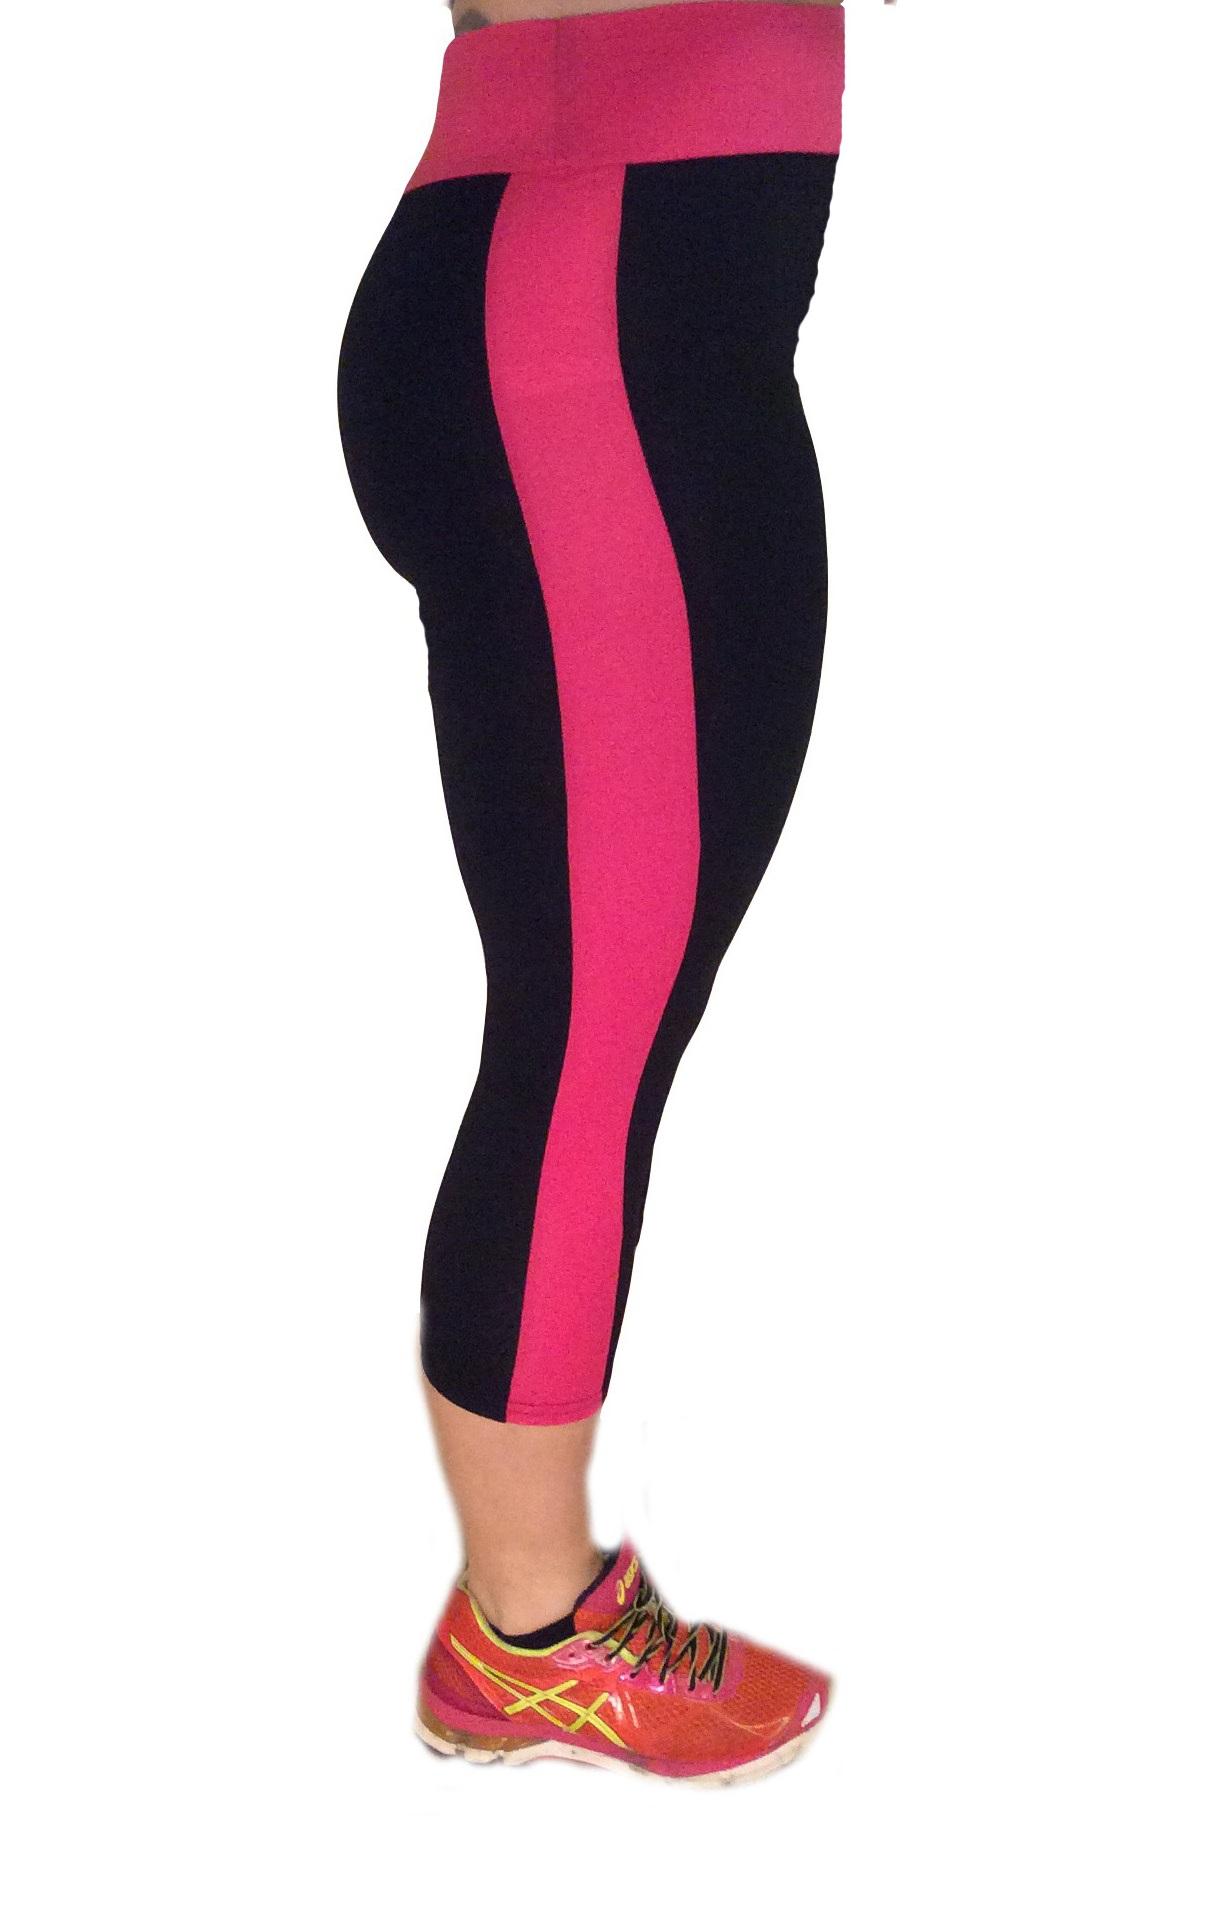 Leggings Nuria Svart/Rosa (XL)